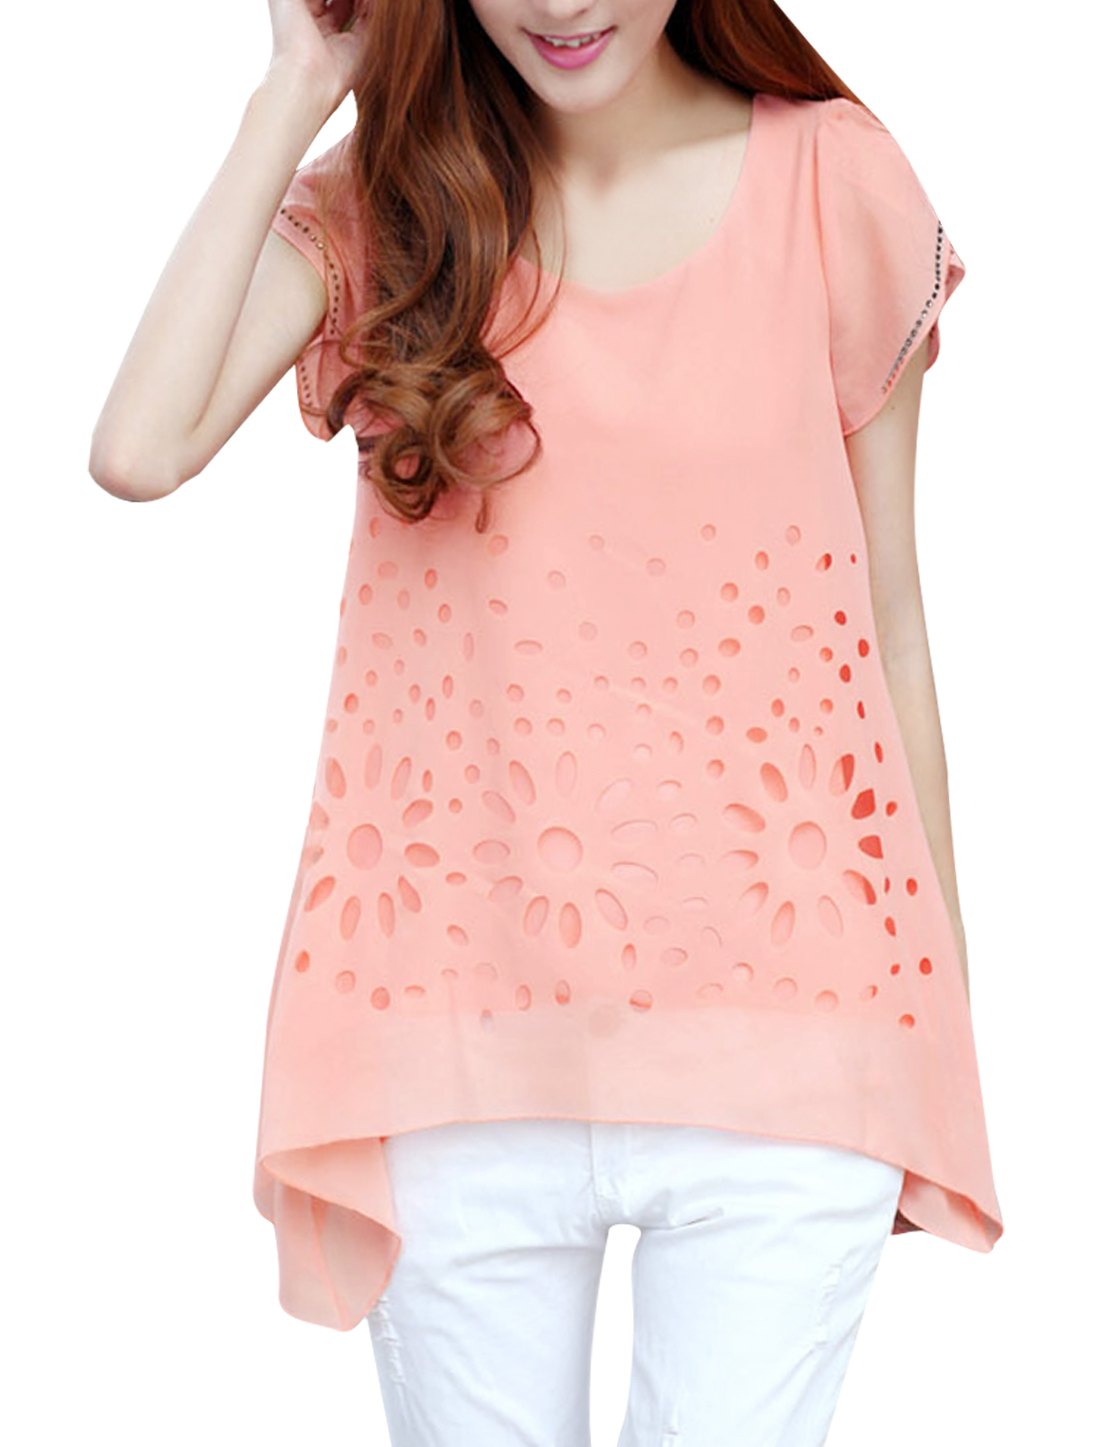 Ladies Round Neck Cap Sleeve Rhinestone Decor Top Shirt Pink S